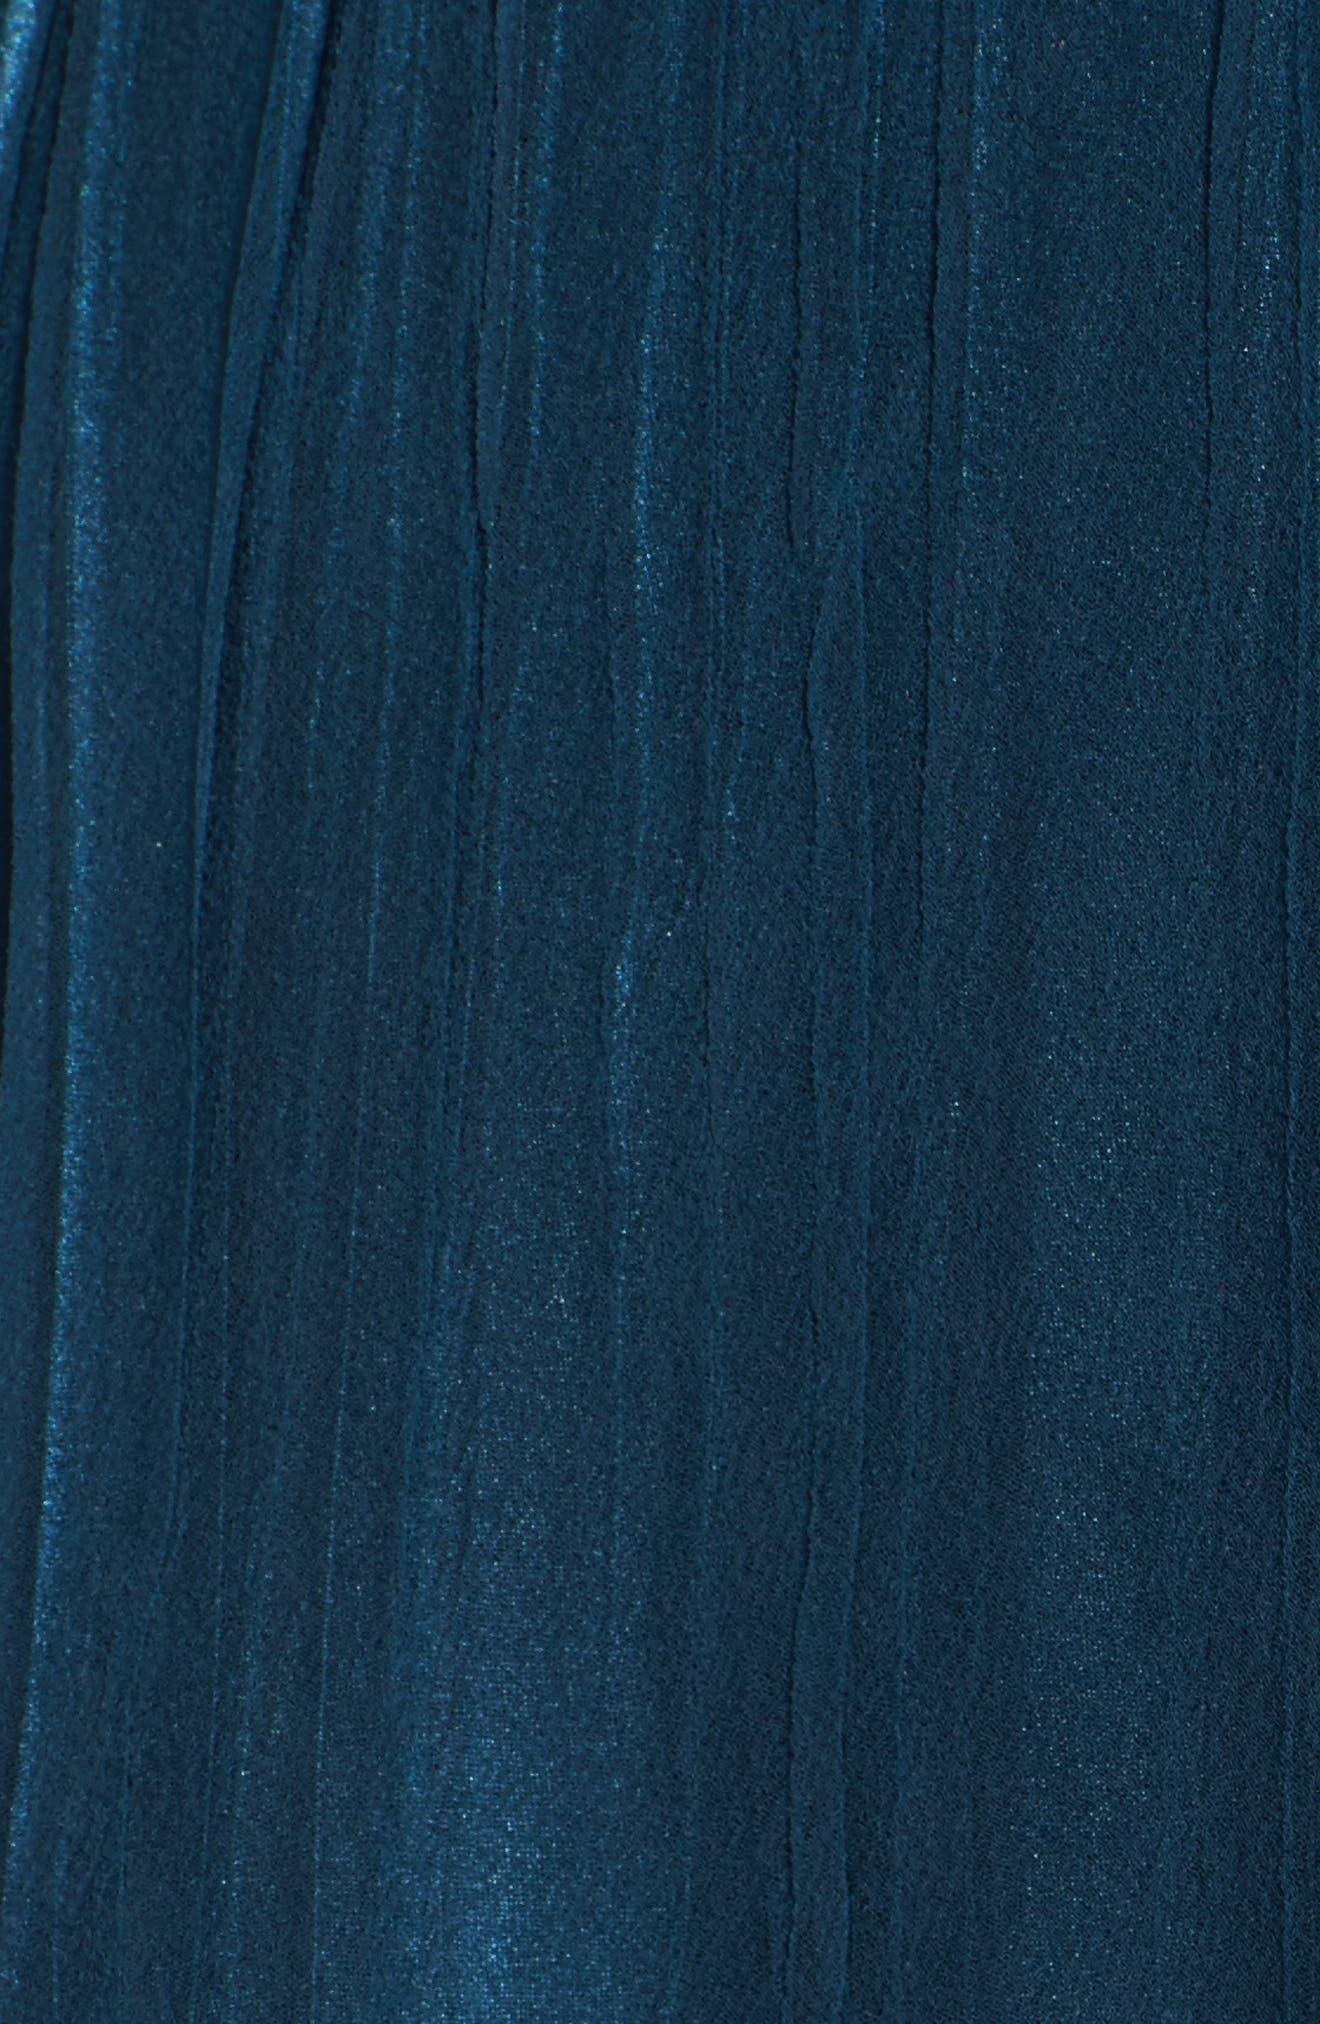 Chiffon Overlay Long Blouson Dress,                             Alternate thumbnail 5, color,                             400